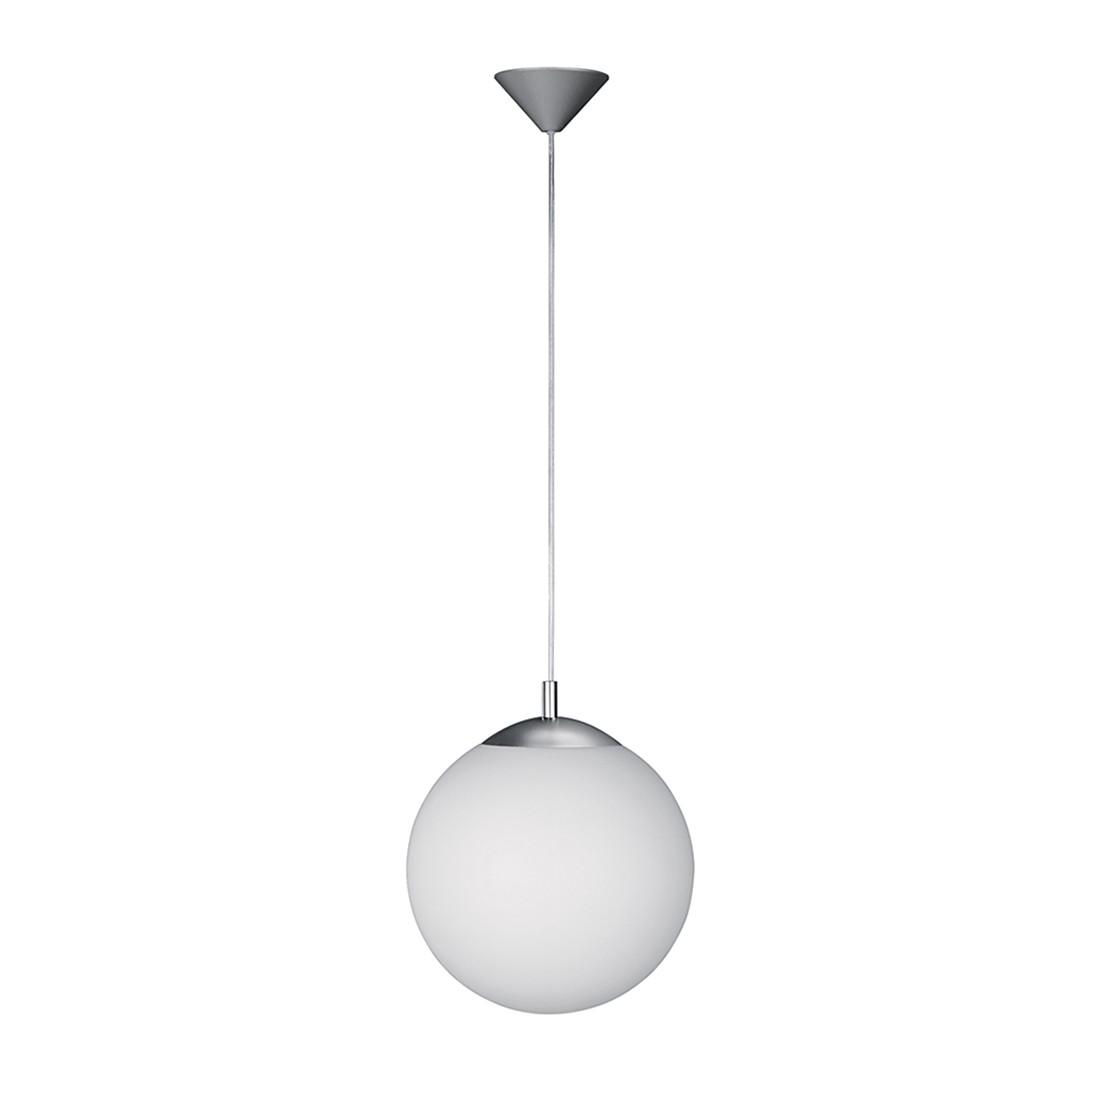 pendelleuchte point metall glas 1 flammig lux a online. Black Bedroom Furniture Sets. Home Design Ideas